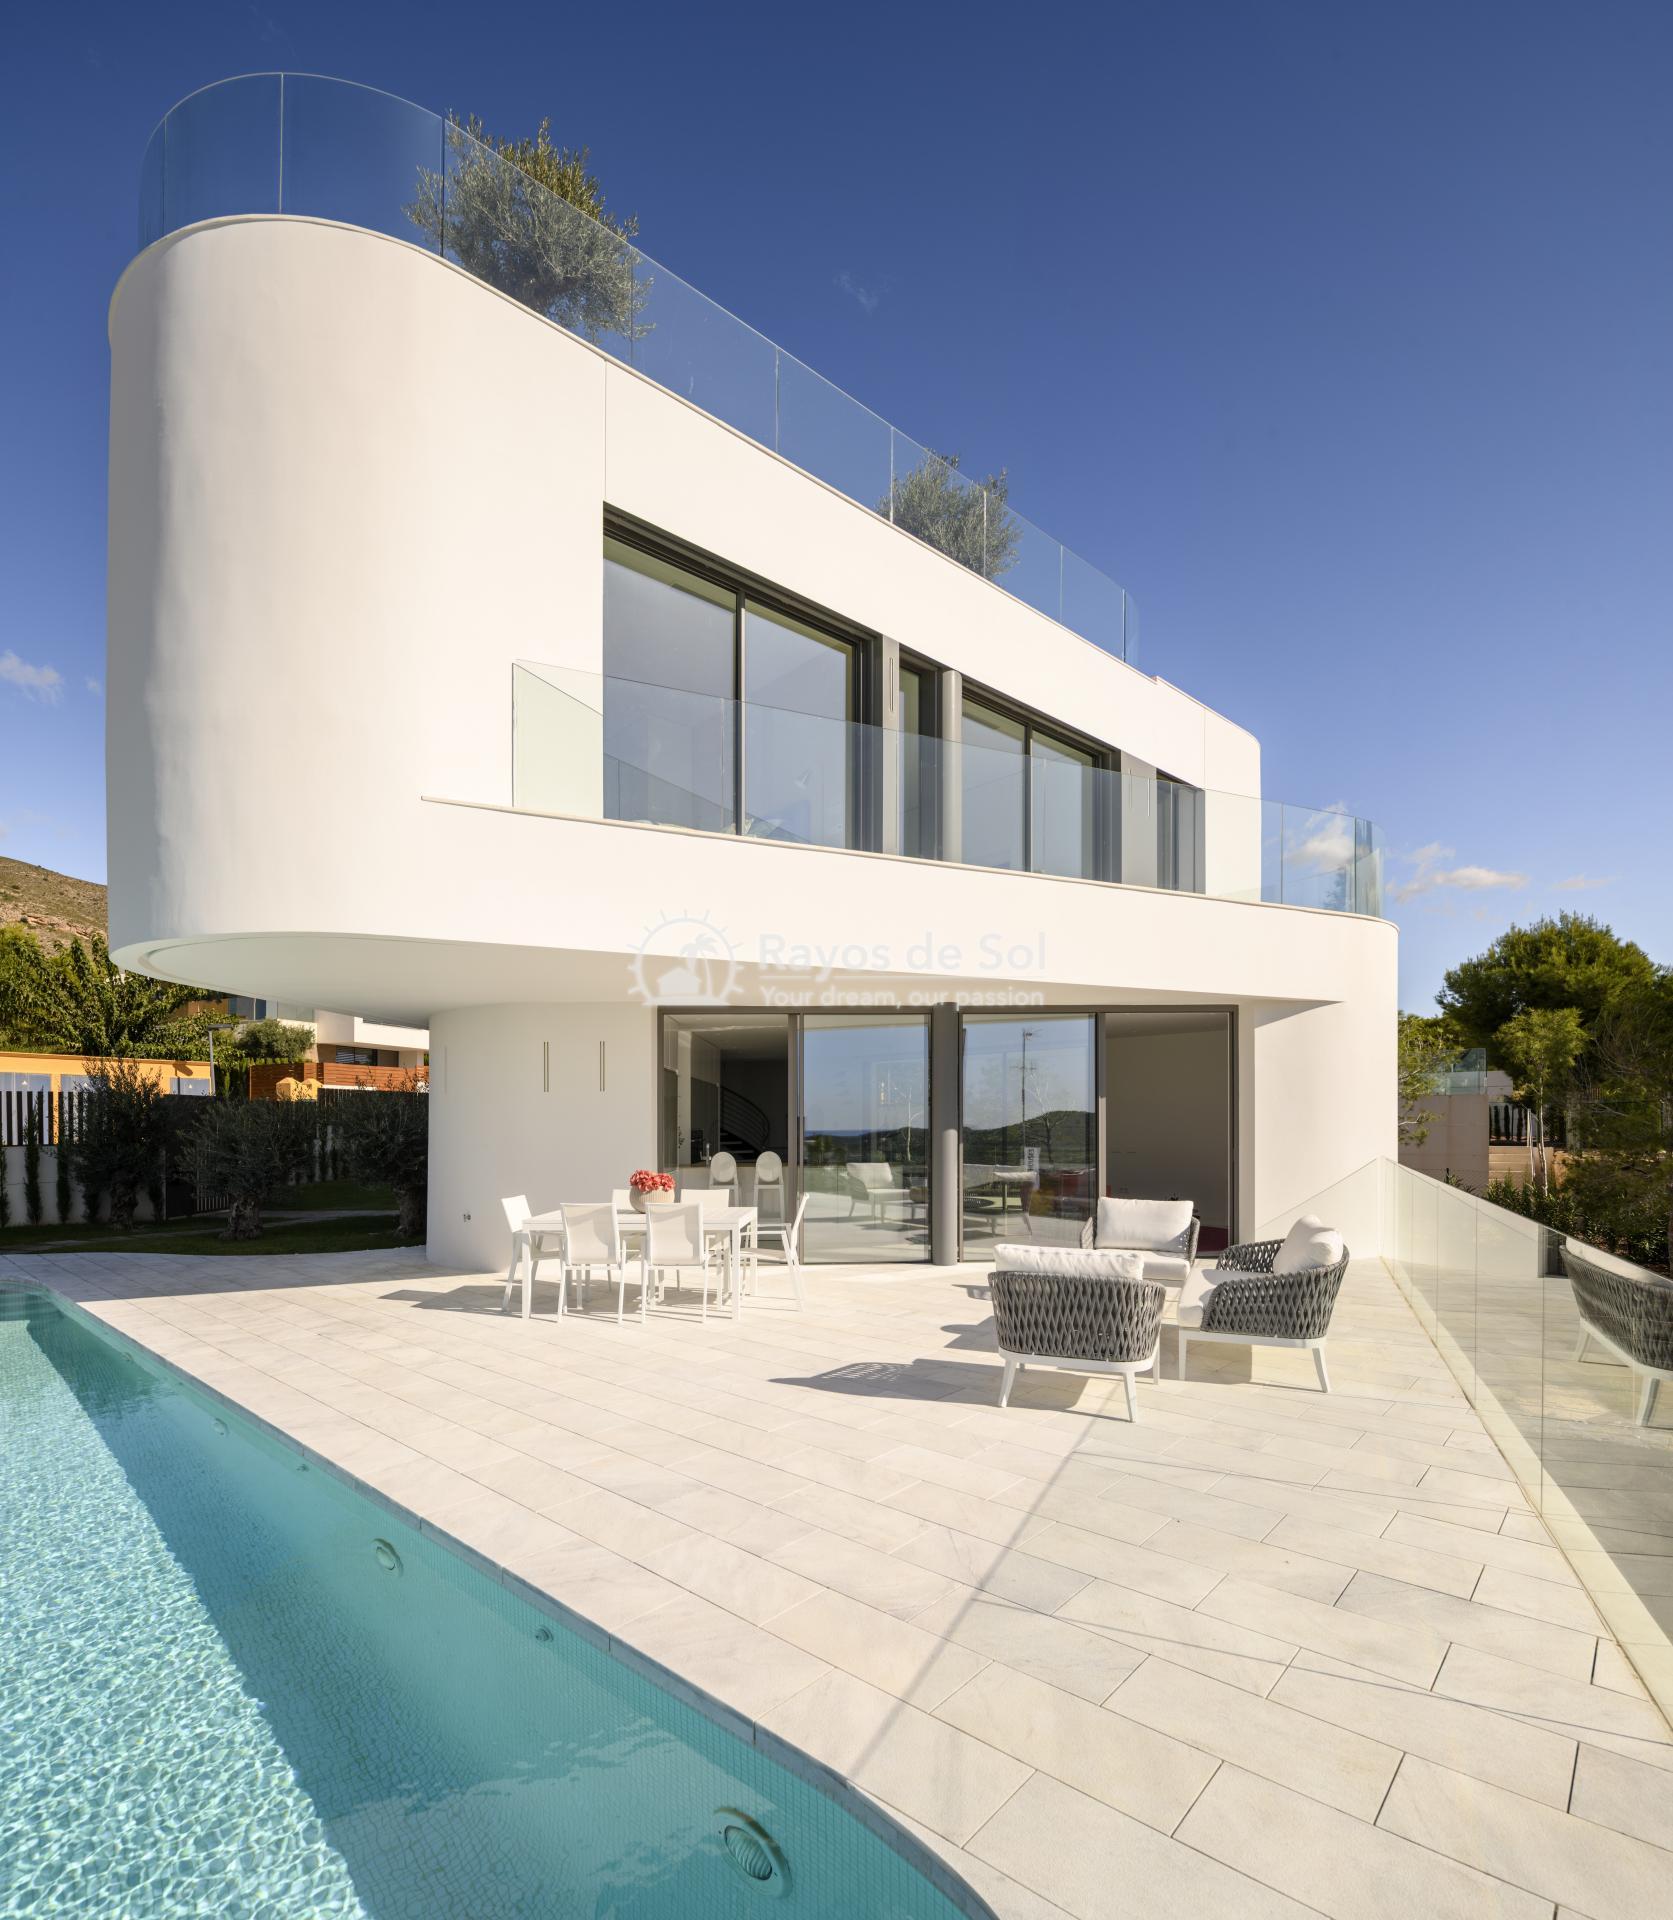 Stunning modern design villa  in Sierra Cortina, Finestrat, Costa Blanca (Praga 19) - 86